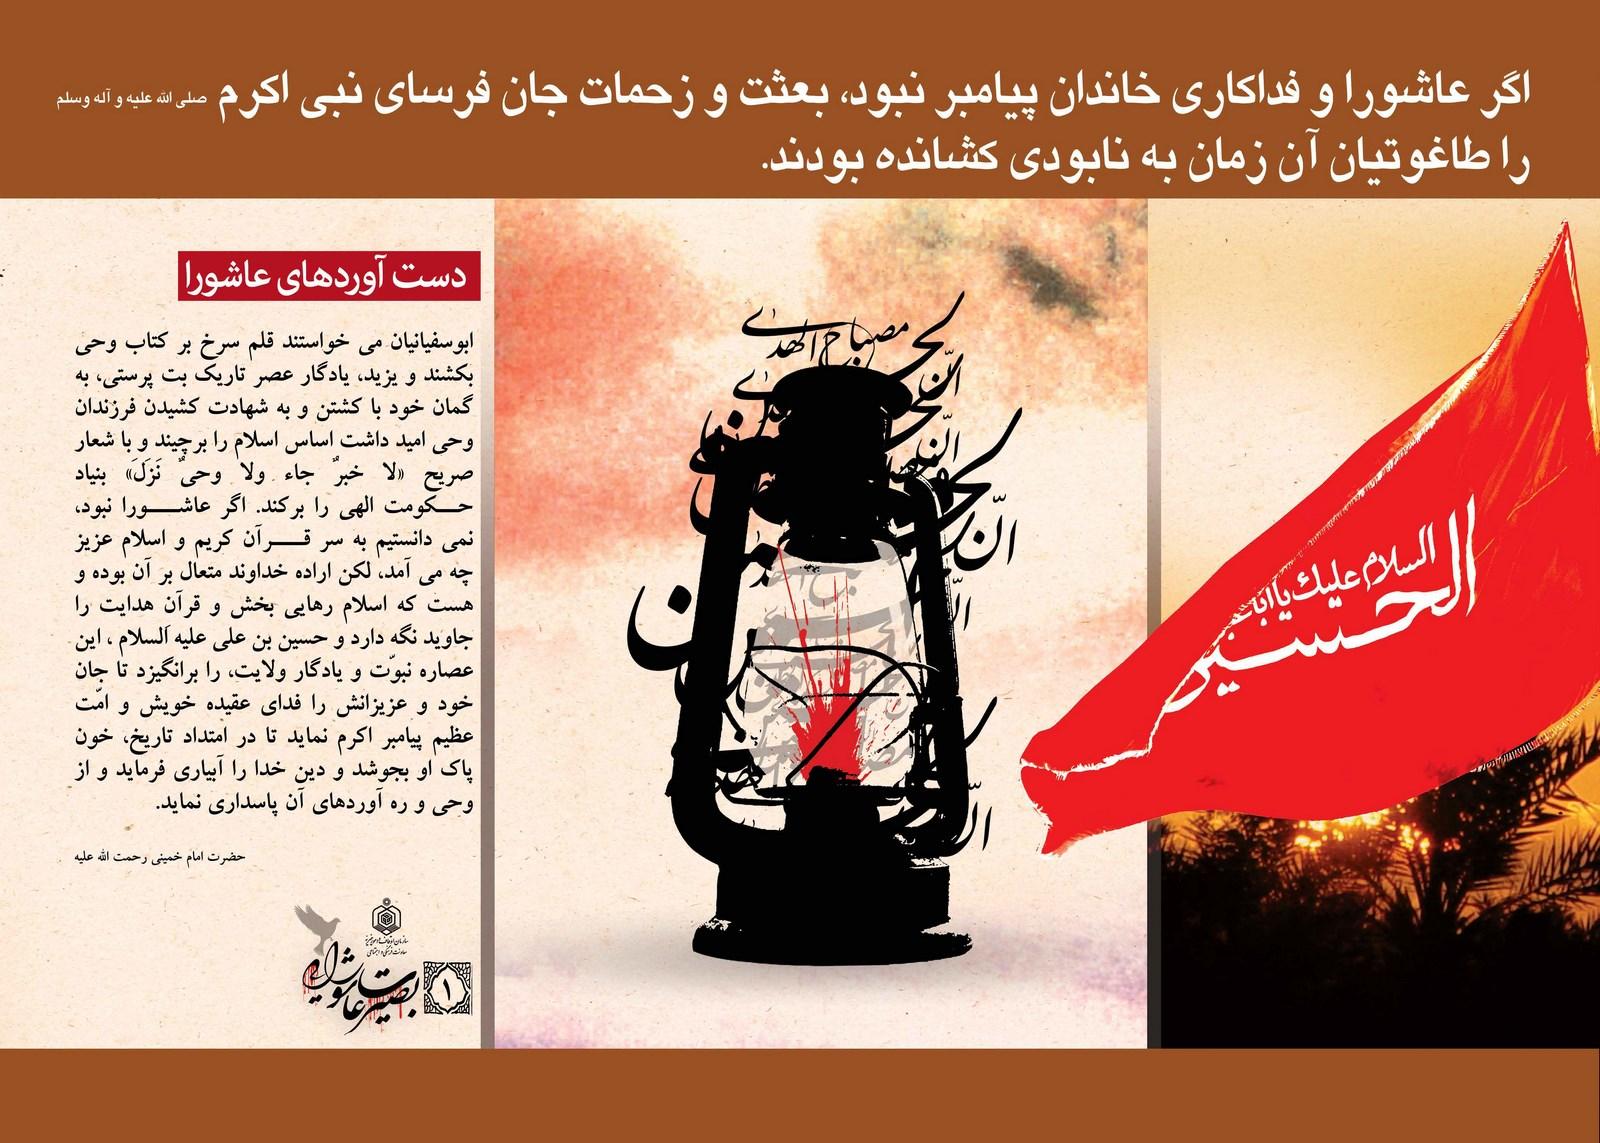 http://ahlolbait.com/files/u65/basirat_ashooraei1.jpg